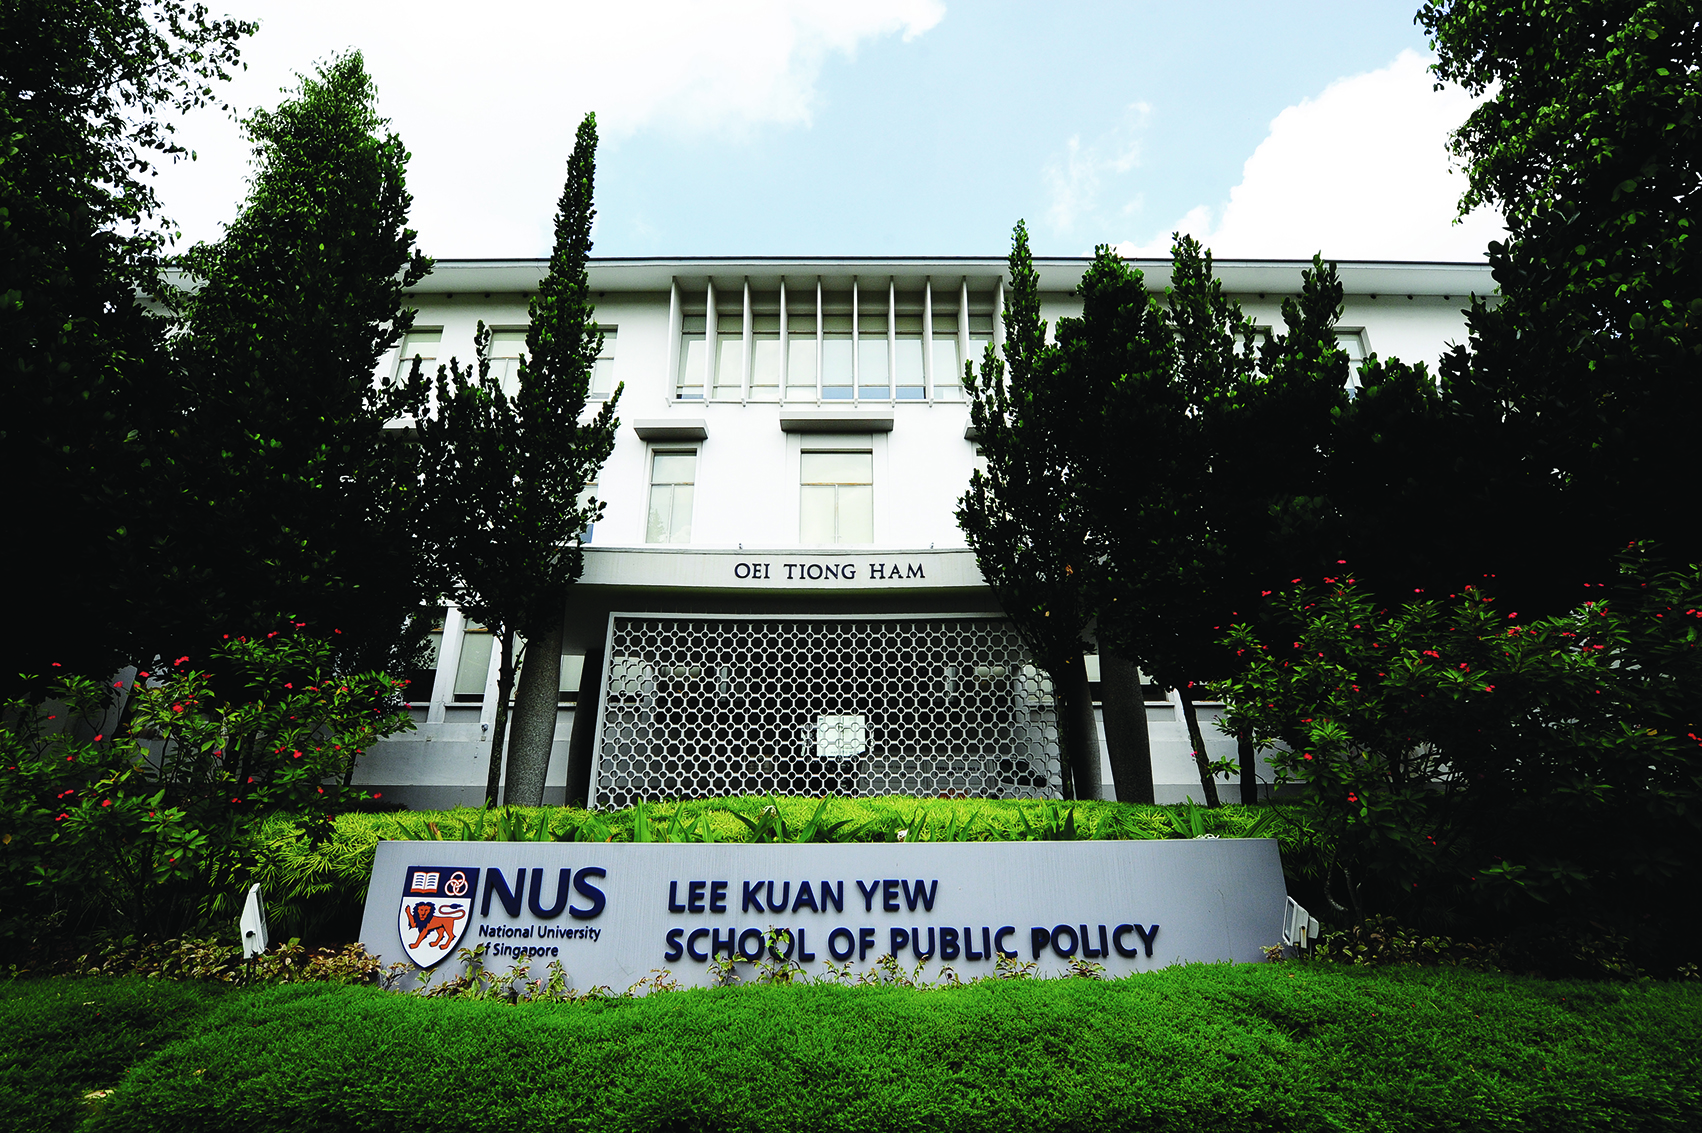 lee kuan yew school of public policy yearbook 10.jpg